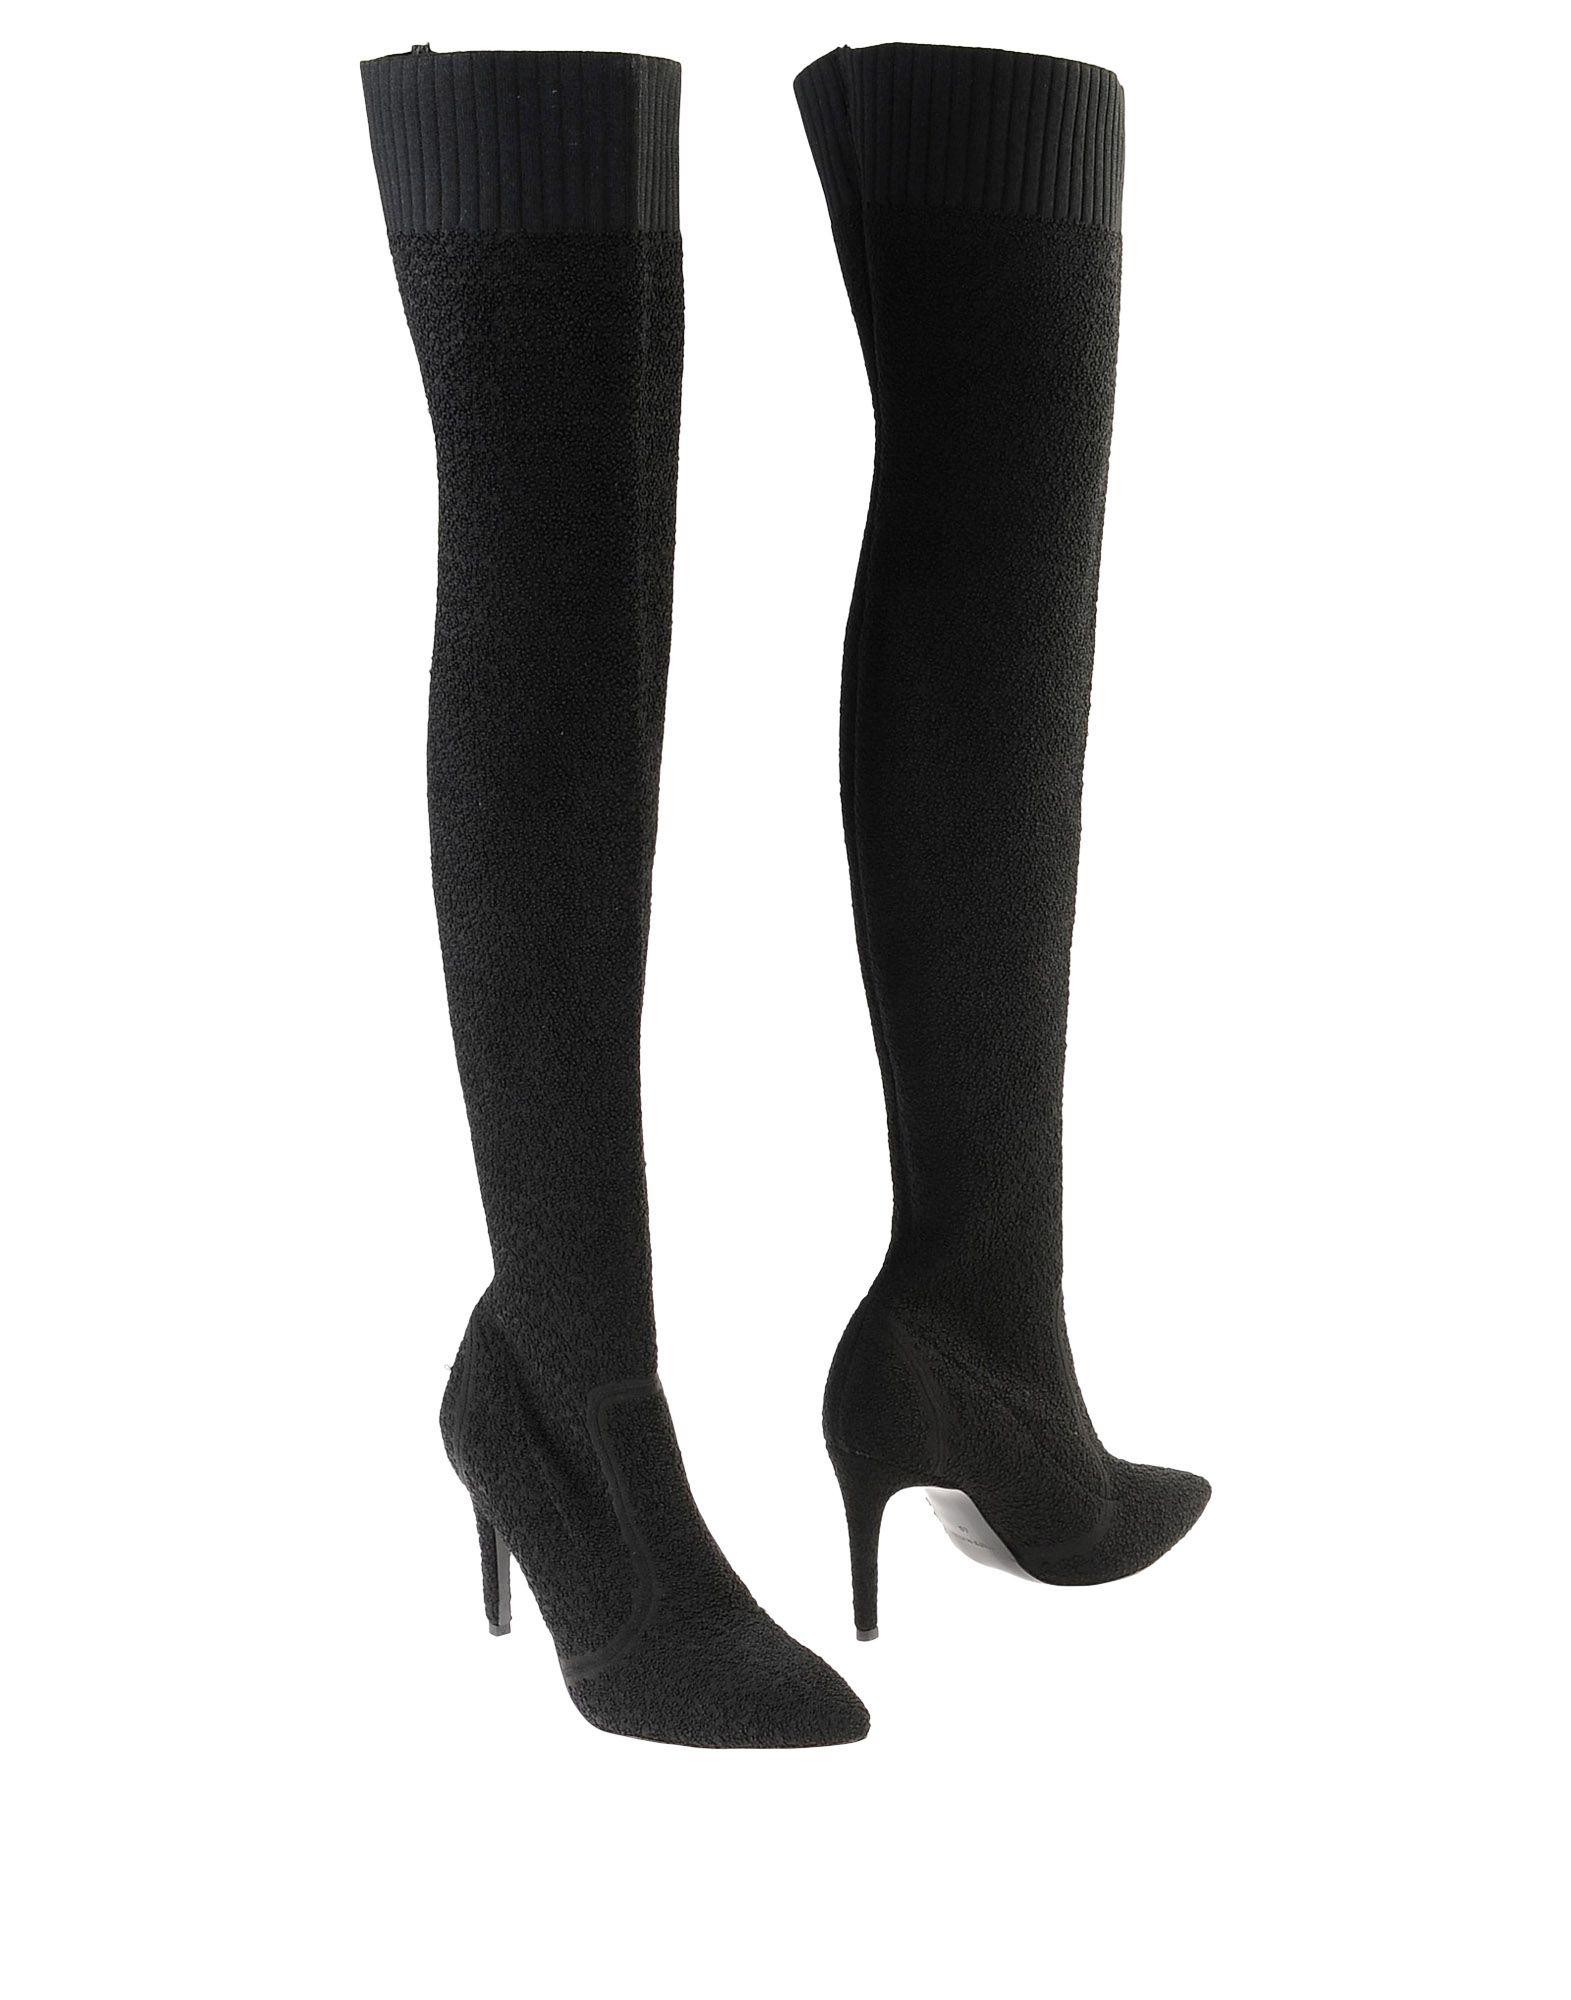 Jolie By Edward Spiers Stiefel Damen  11545006AKGut aussehende strapazierfähige Schuhe